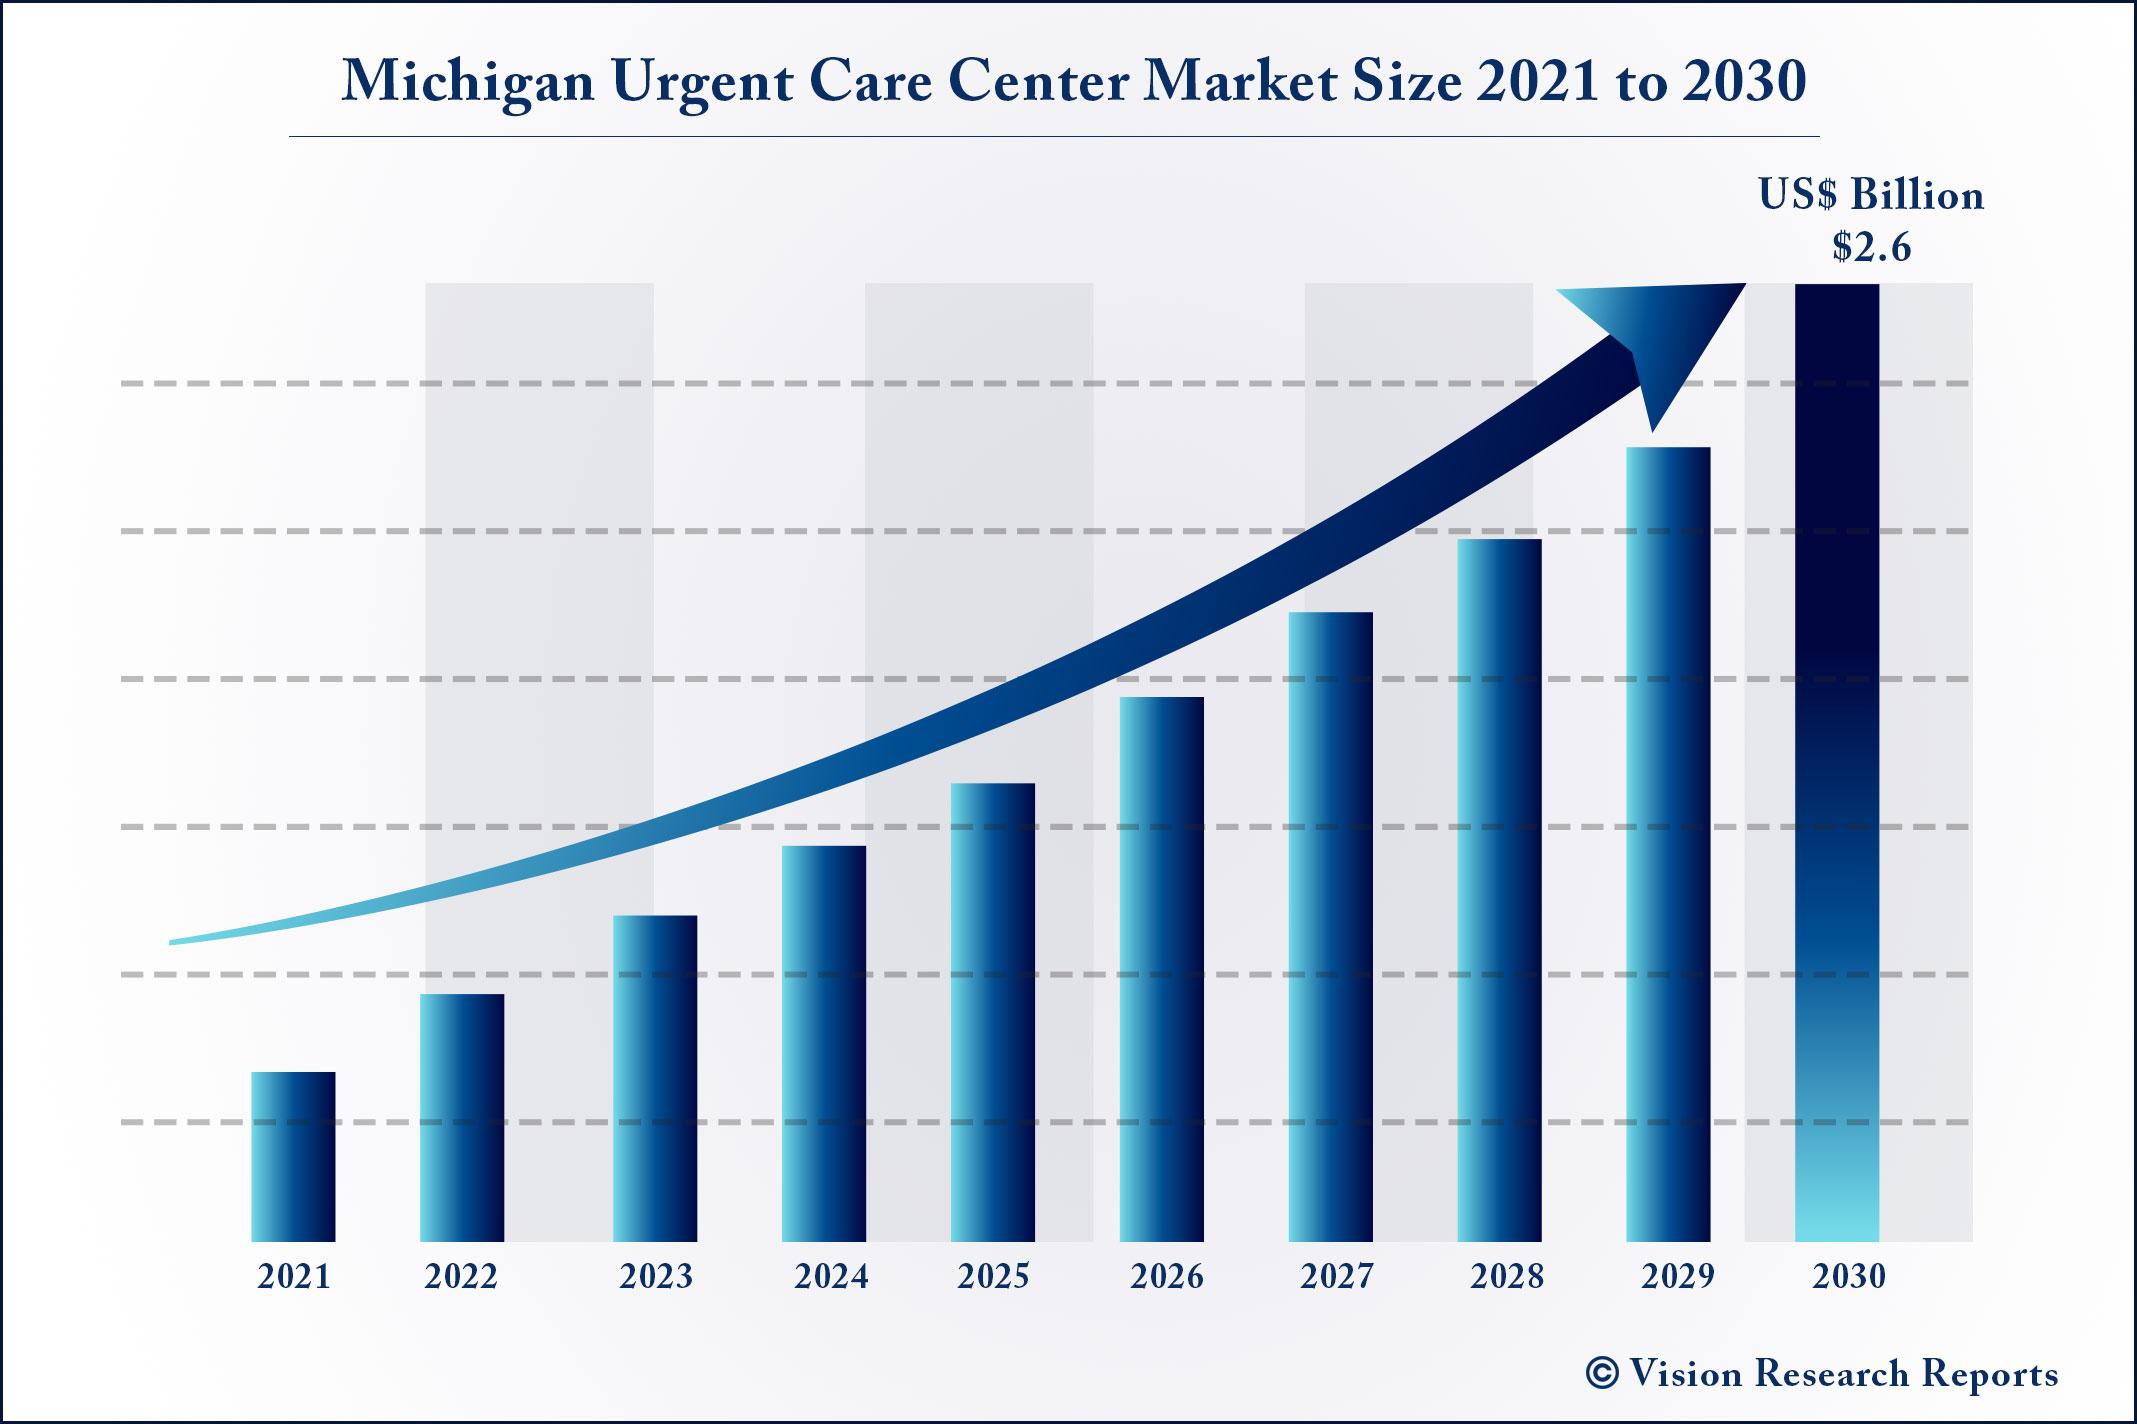 Michigan Urgent Care Center Market Size 2021 to 2030